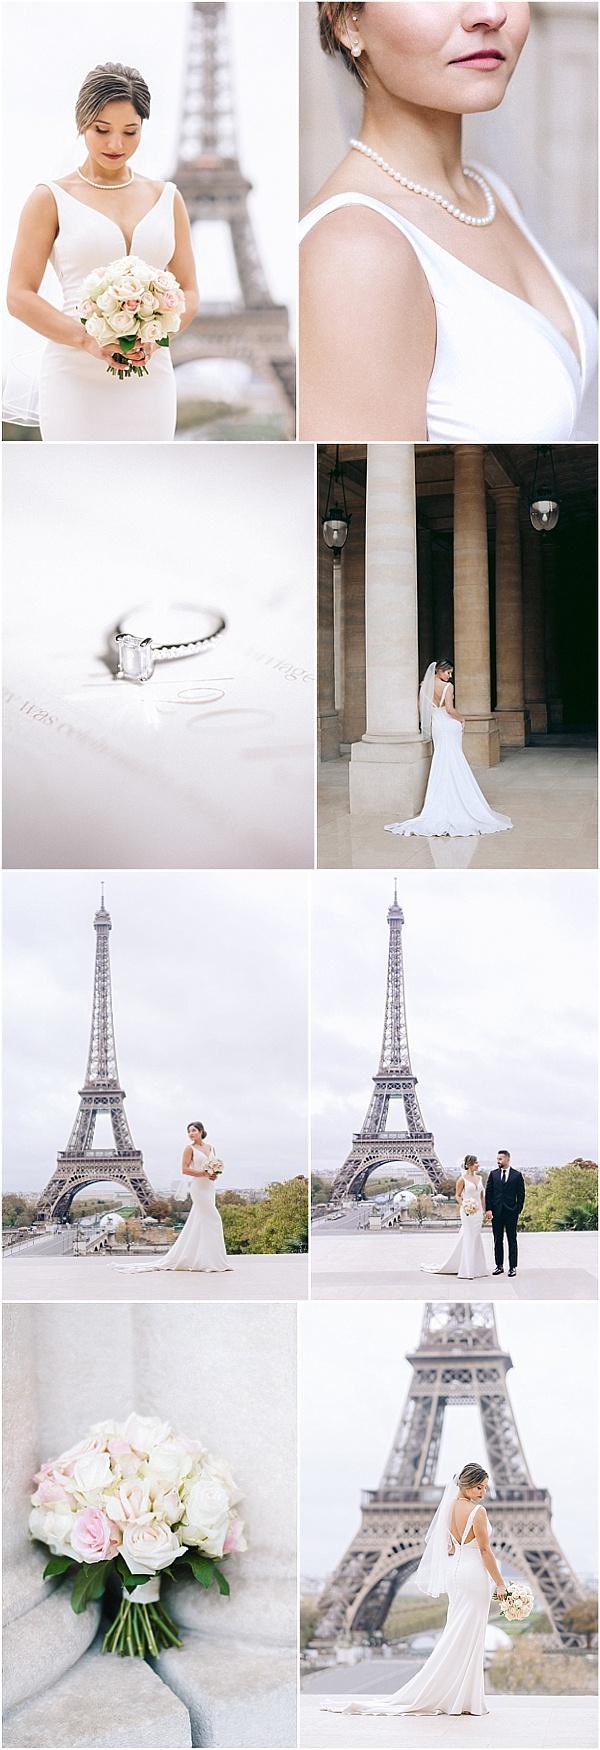 How to Elope to Paris Snapshot